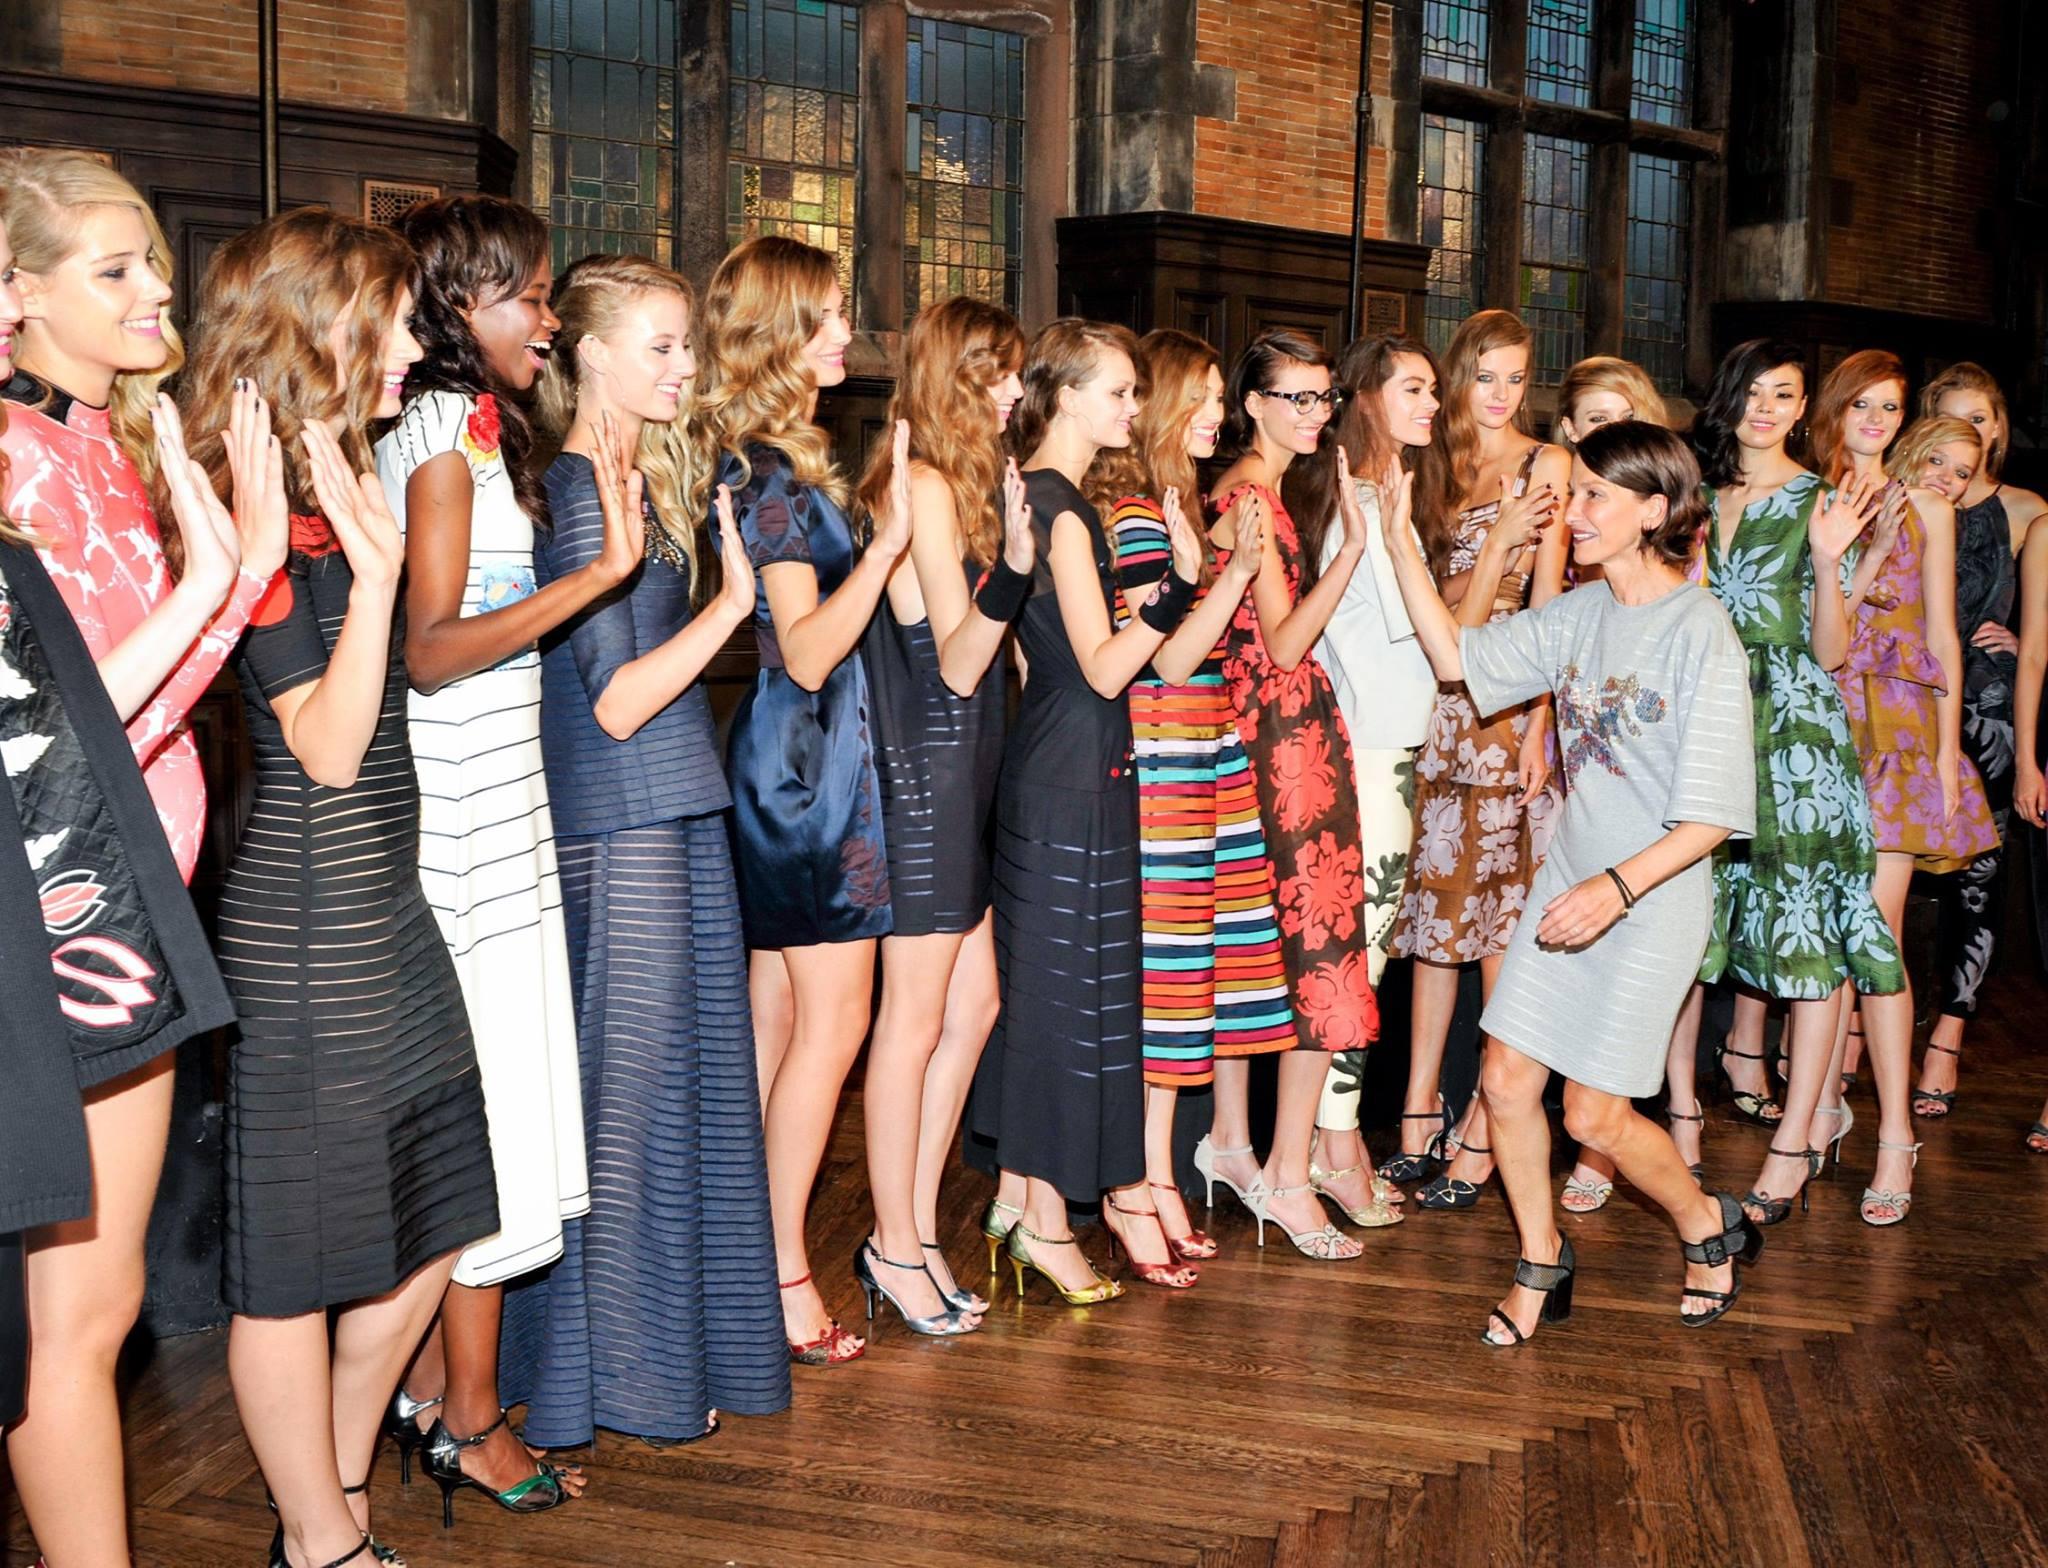 Rowley high-fives models wearing her spring designs. Image via Cynthia Rowley/Facebook